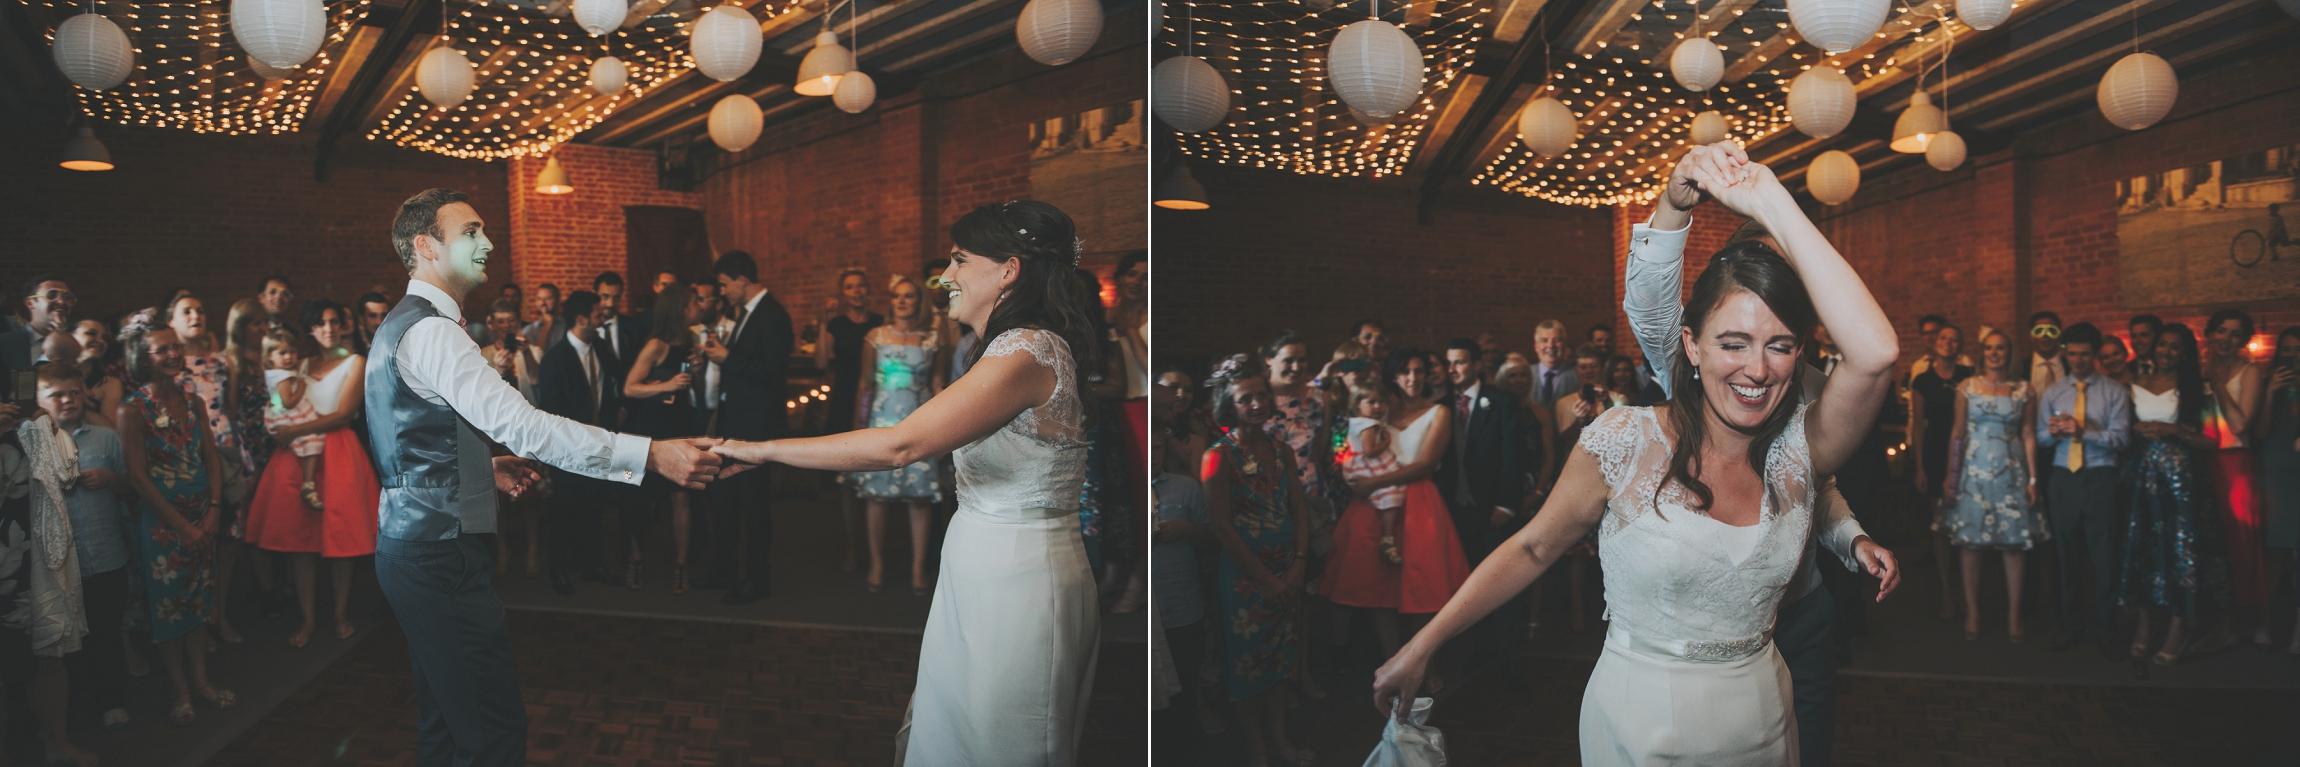 Oxford-Wedding-Photographer_0034.jpg